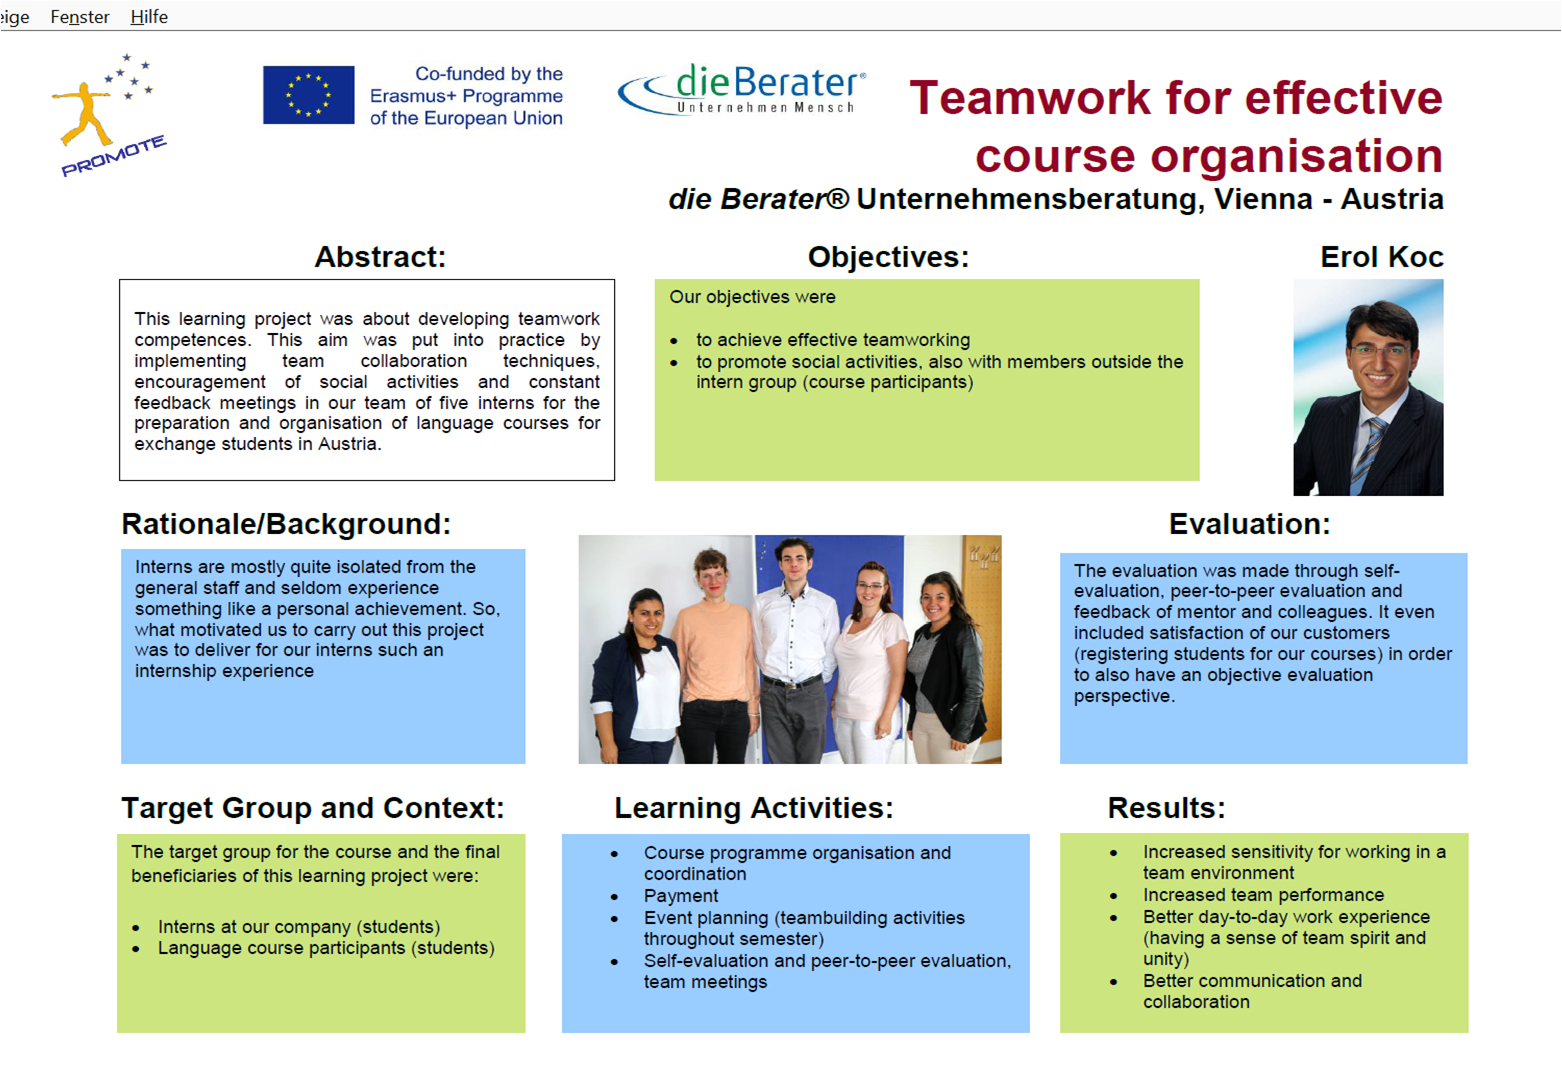 dieBerater_Teamwork.png